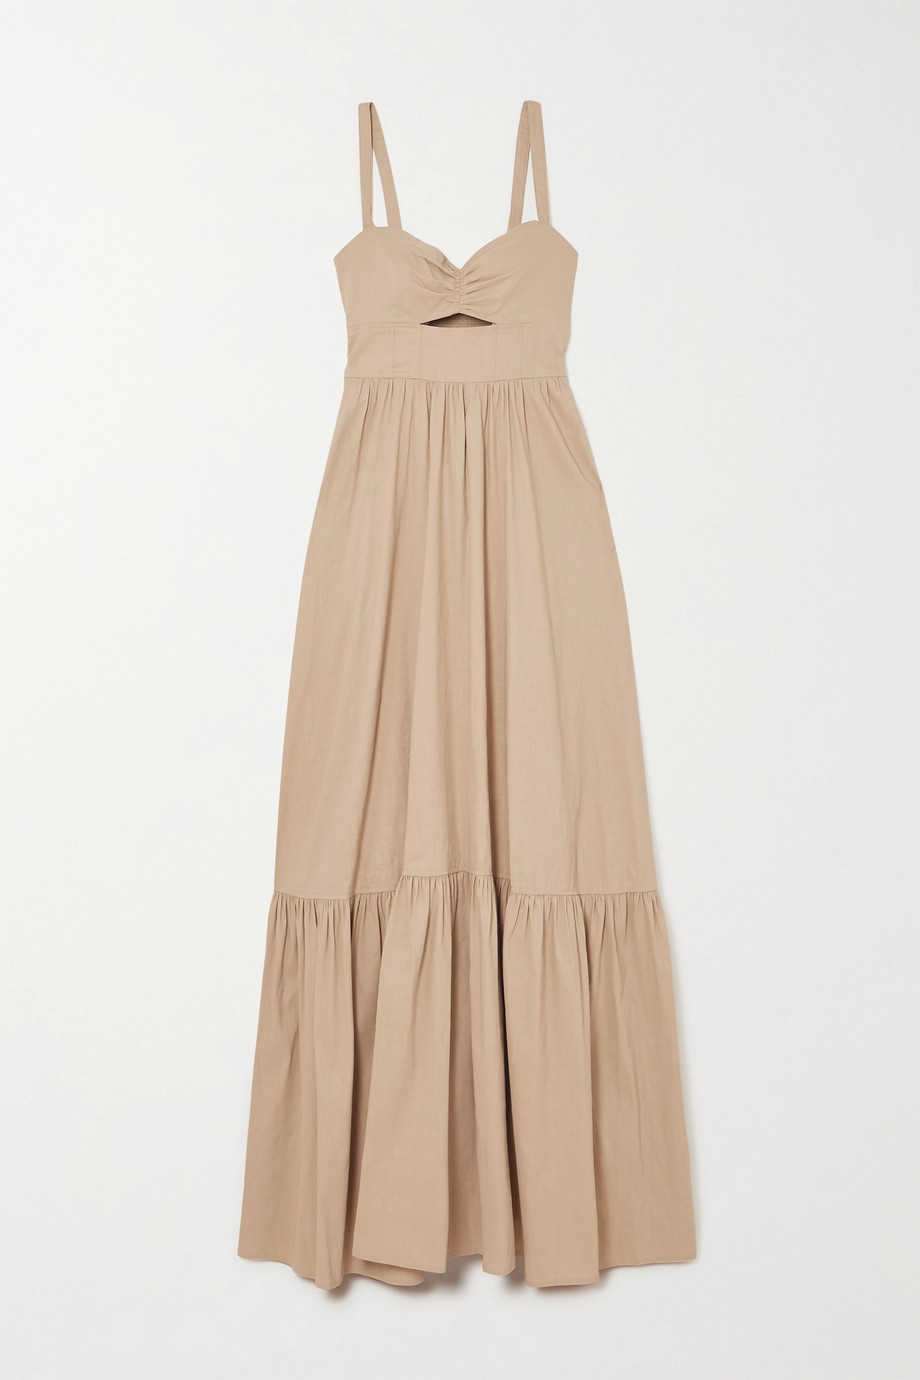 A.L.C. A.L.C. x Petra Flannery Everly cutout smocked linen-blend maxi dress